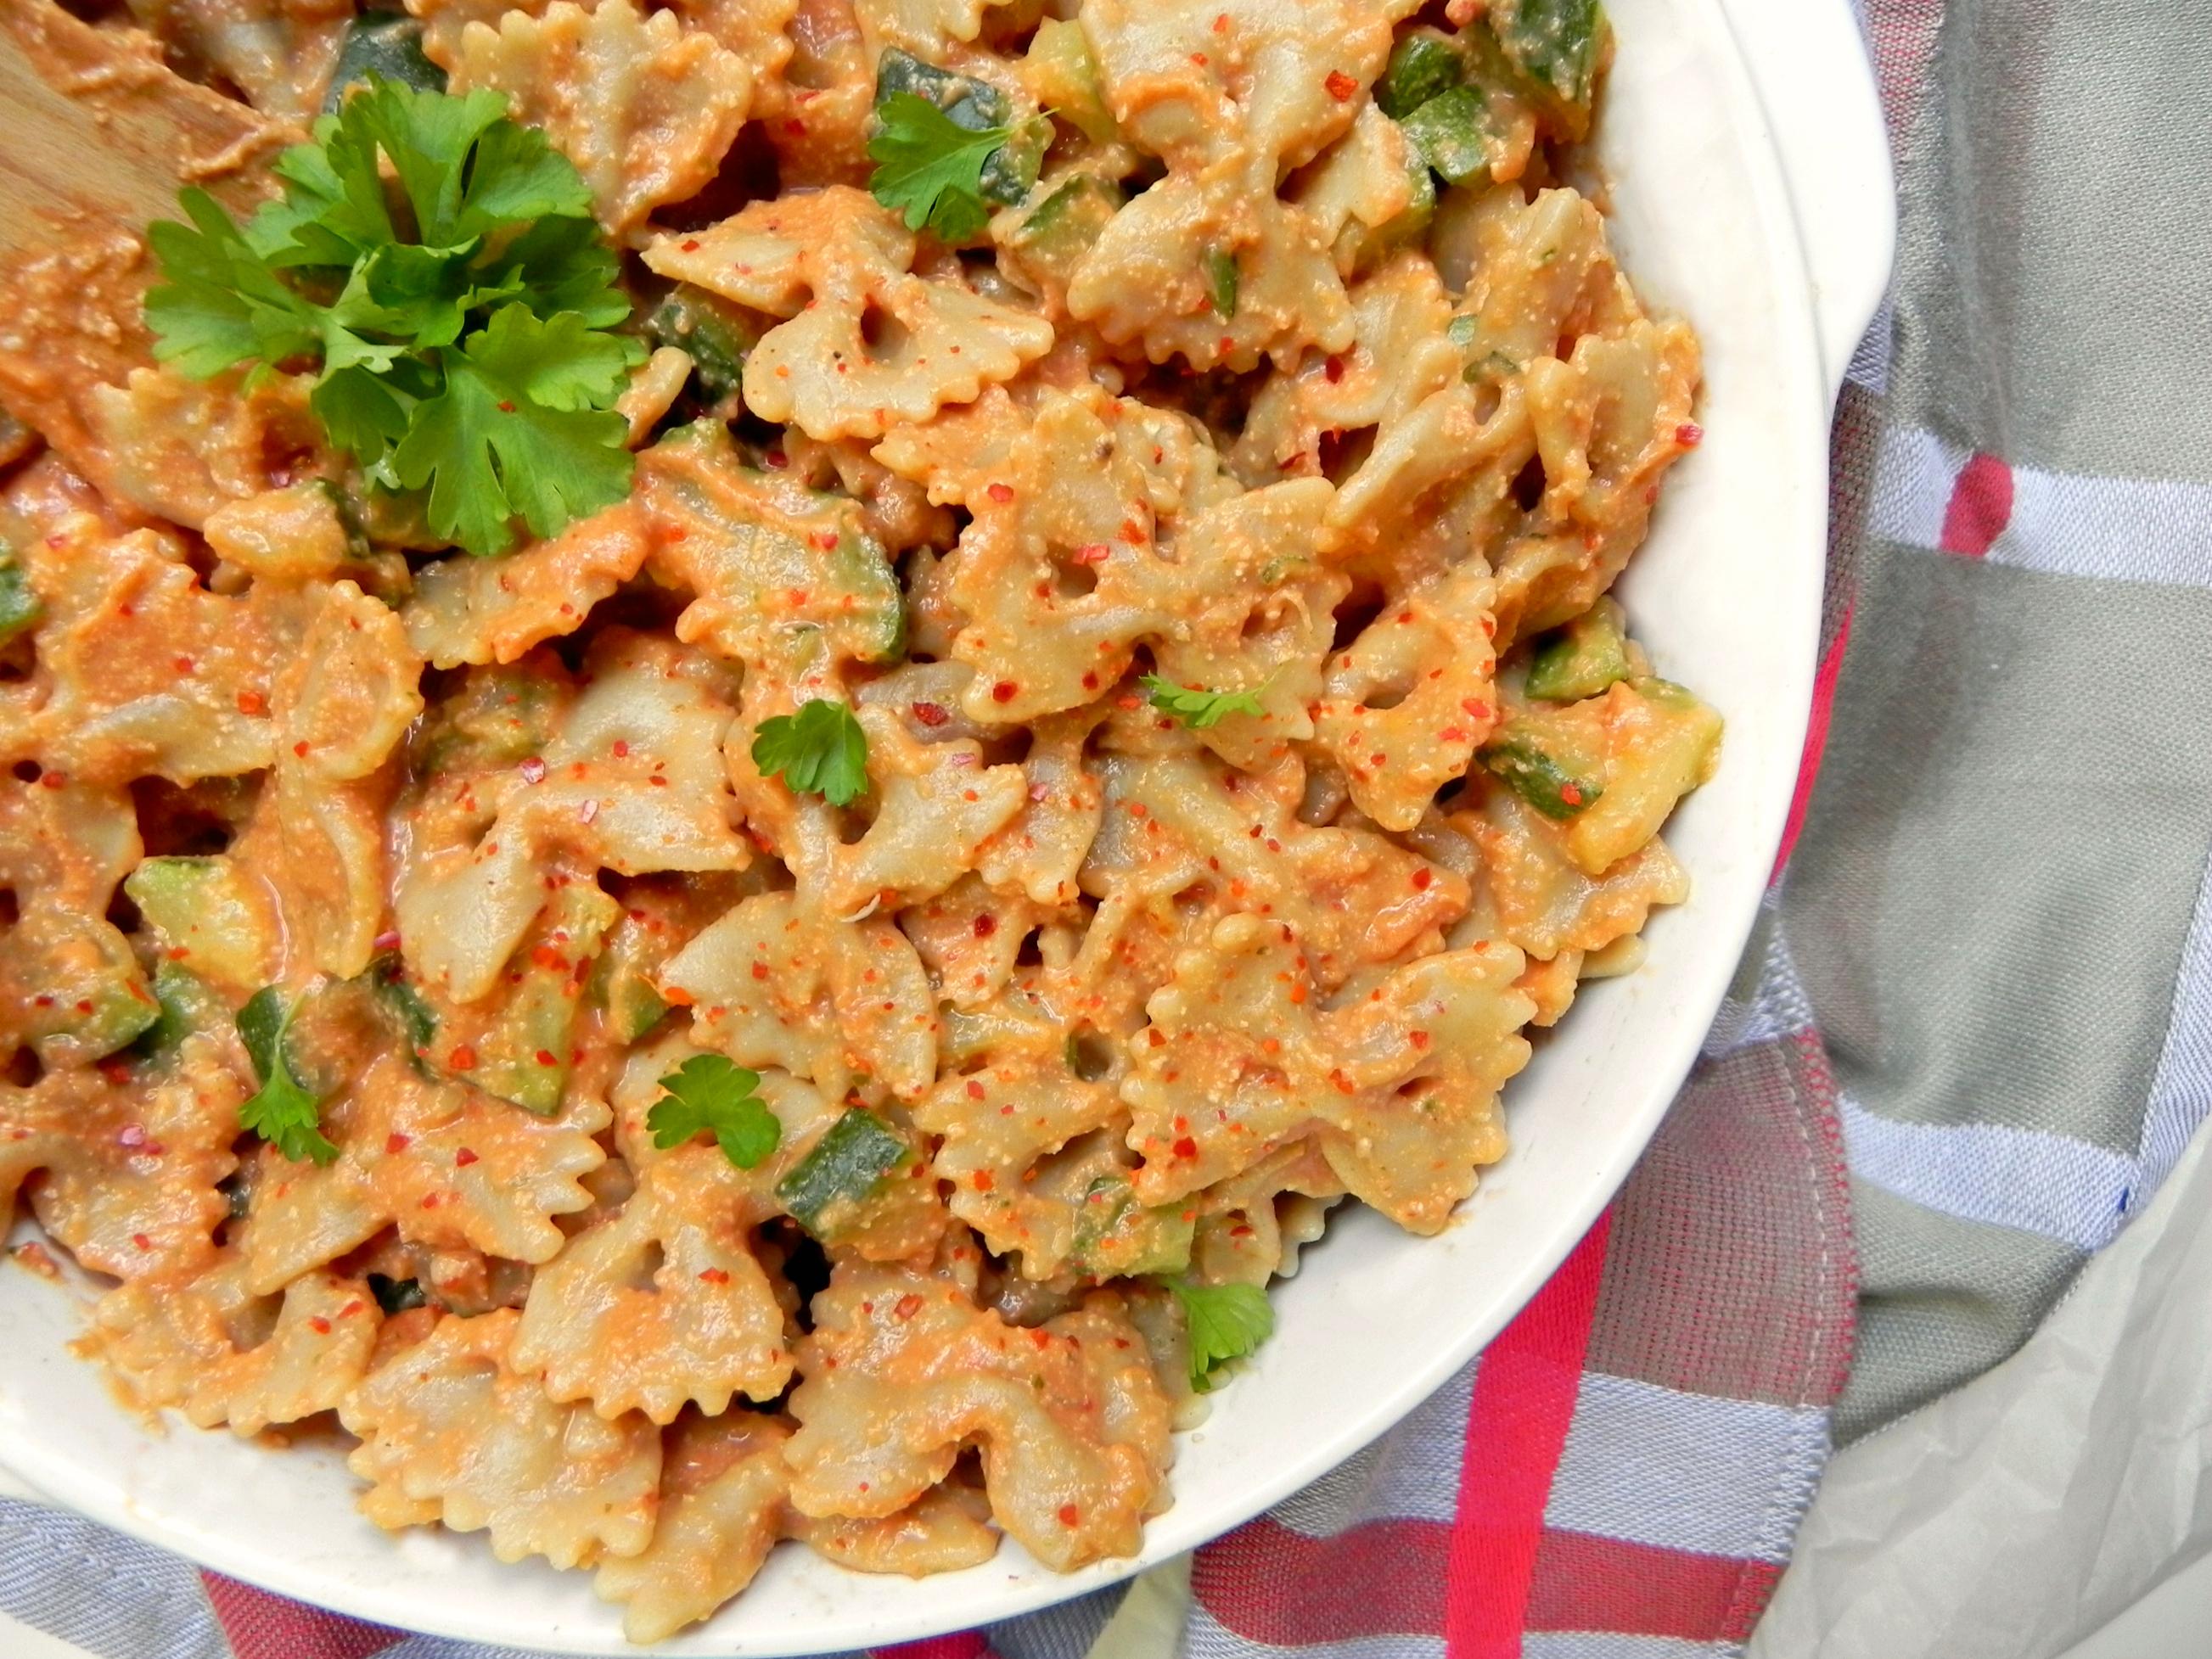 Healthy vegan rose sauce gf ceara 39 s kitchen for V kitchen restaurant vegetarian food